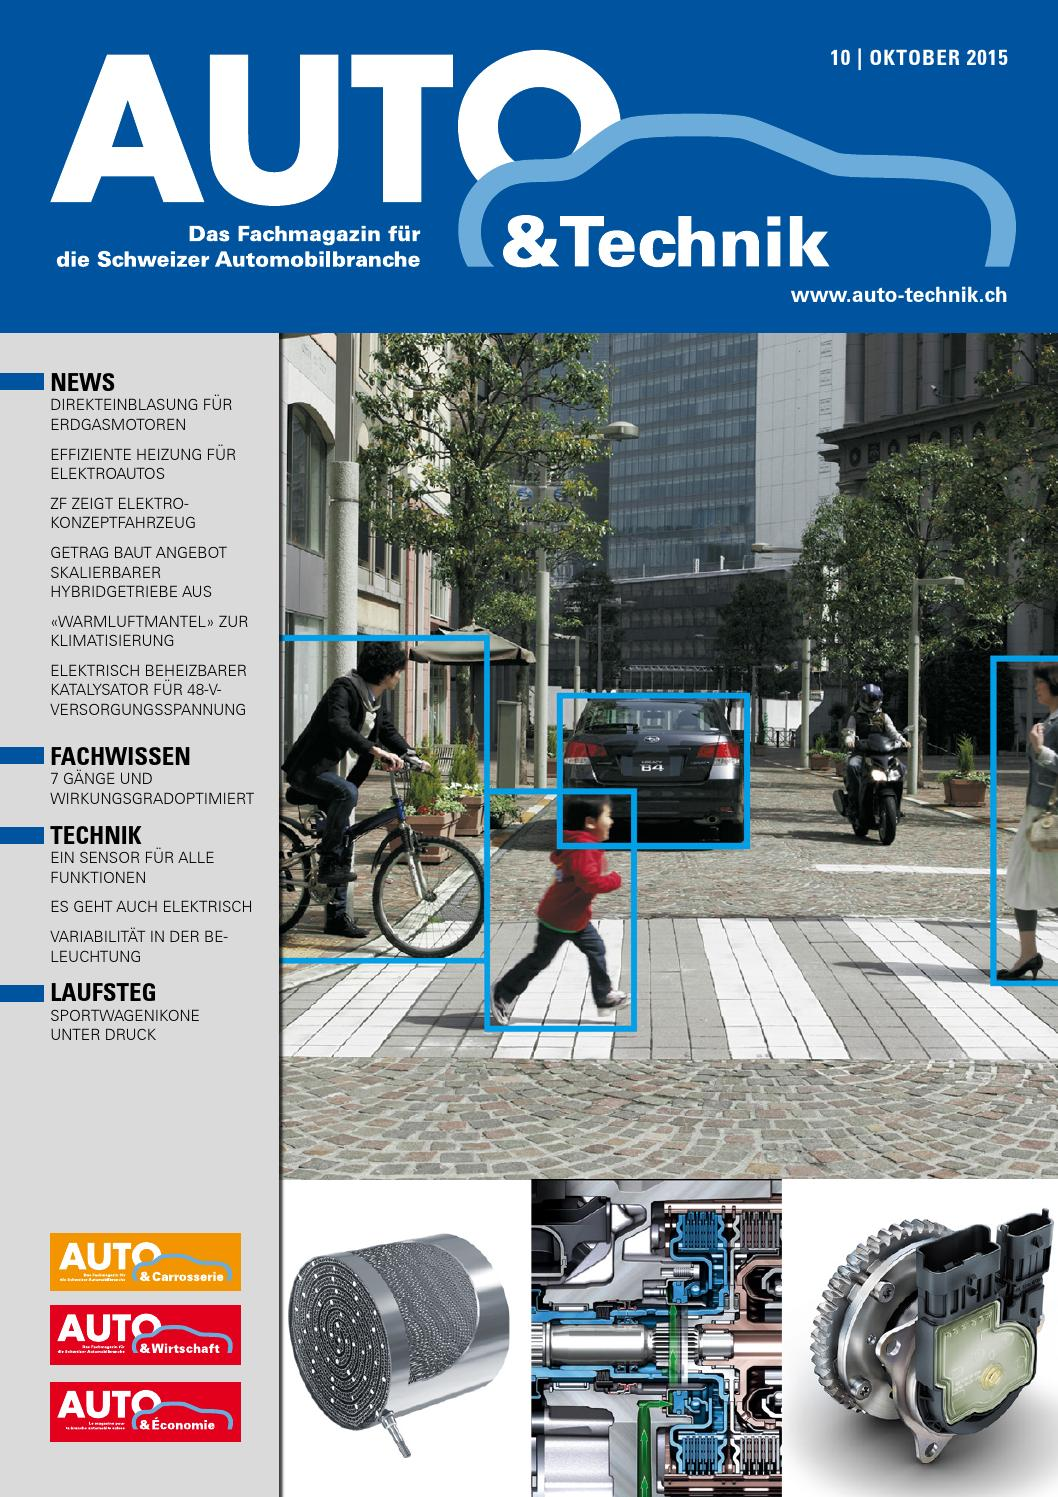 At 10 2015 web by A&W Verlag AG - issuu